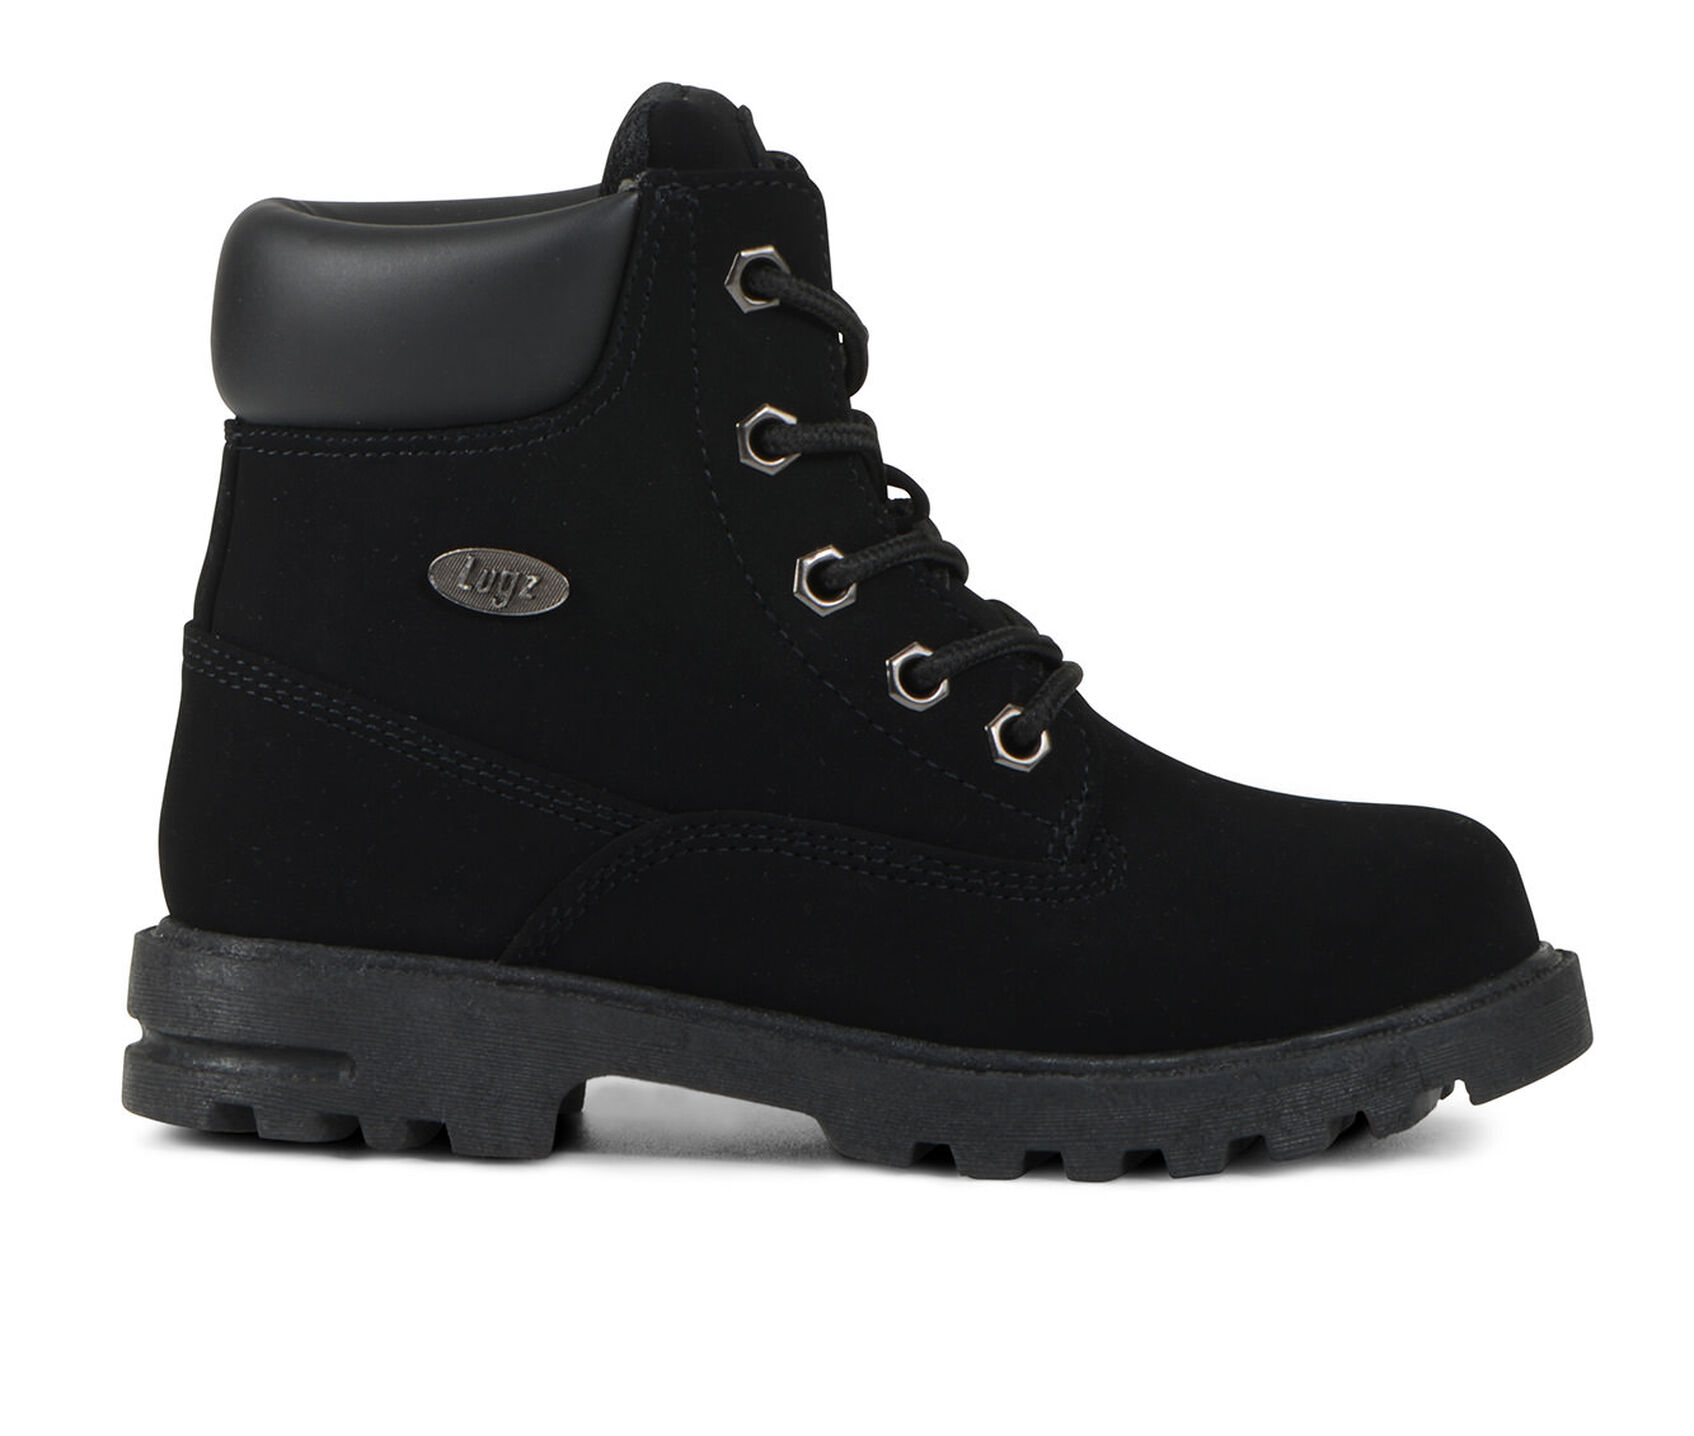 sale online release date release date: Boys' Lugz Little Kid Empire Hi Water Resistant Boots